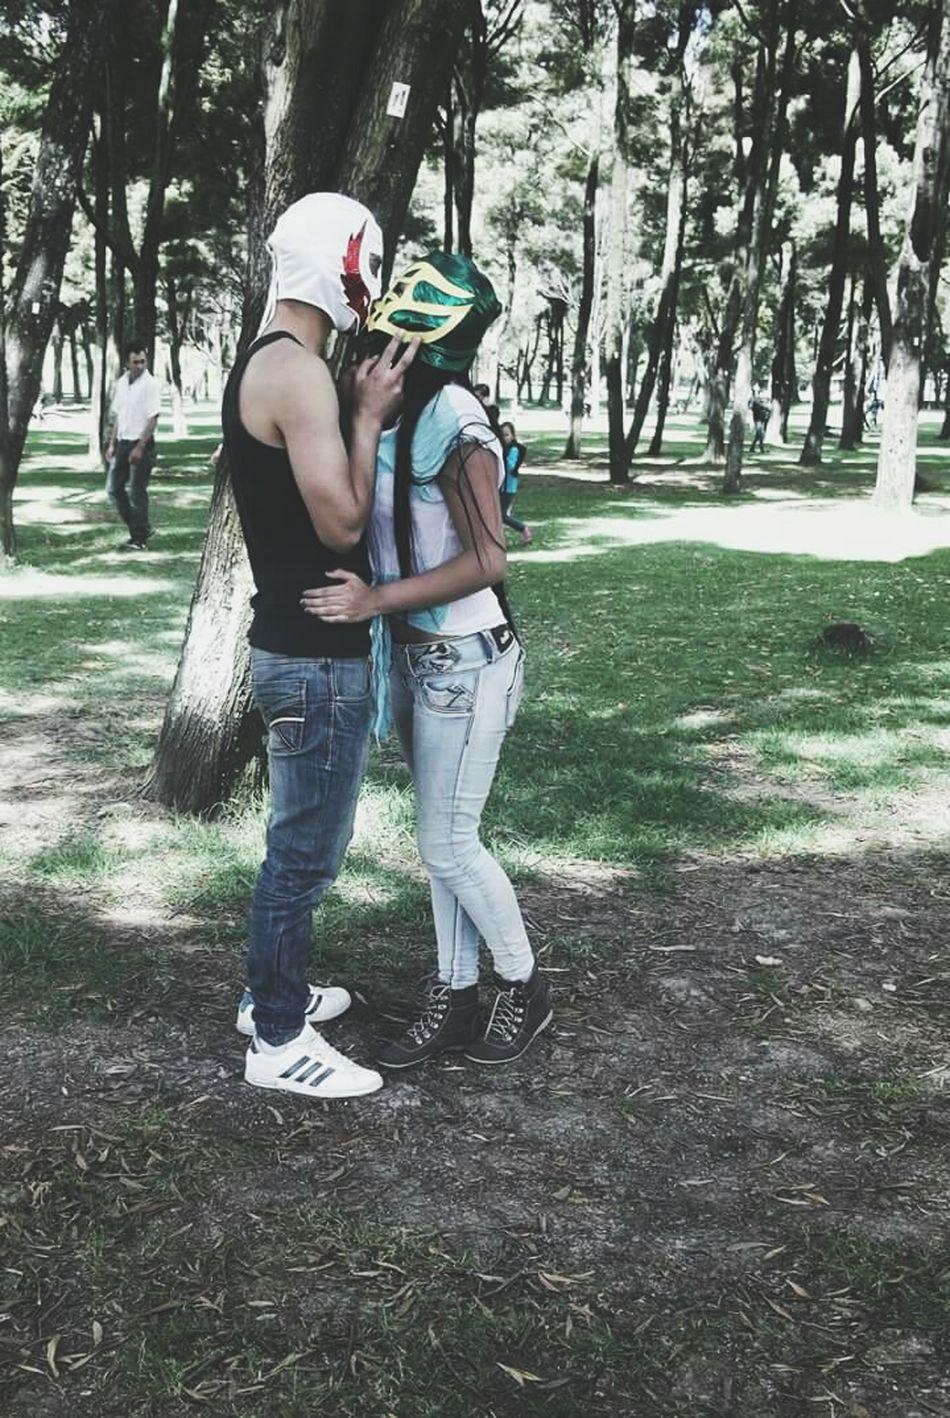 Picnic Bestfriends Besos ♡ Lucha Libre